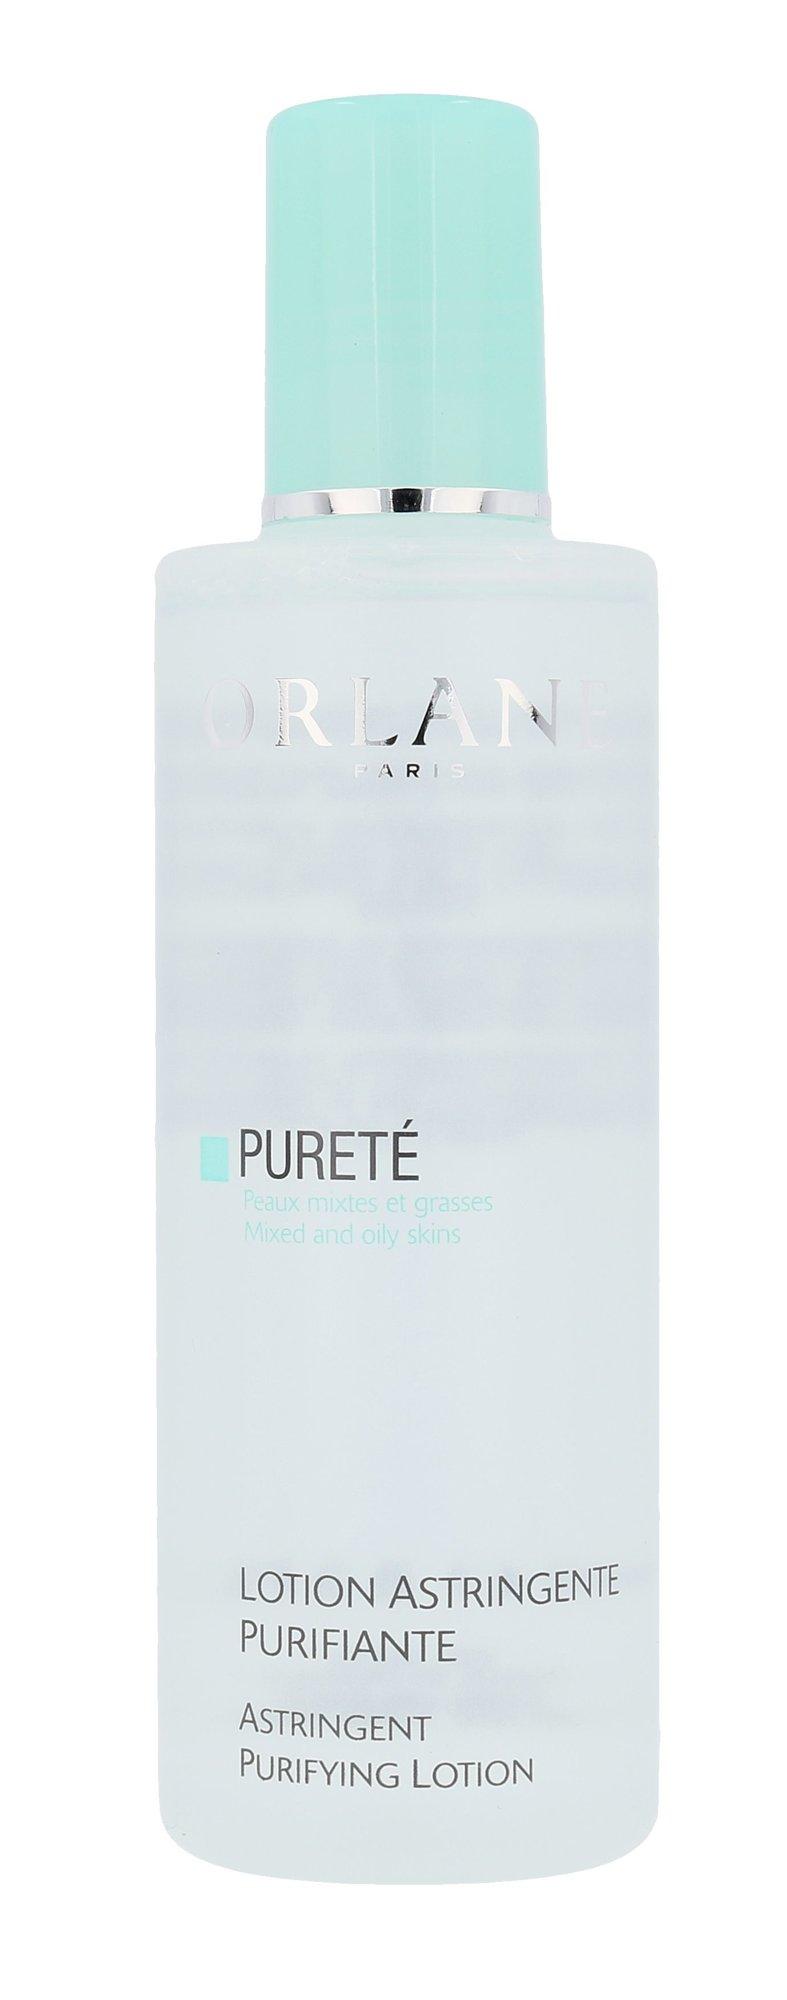 Orlane Pureté Cosmetic 250ml